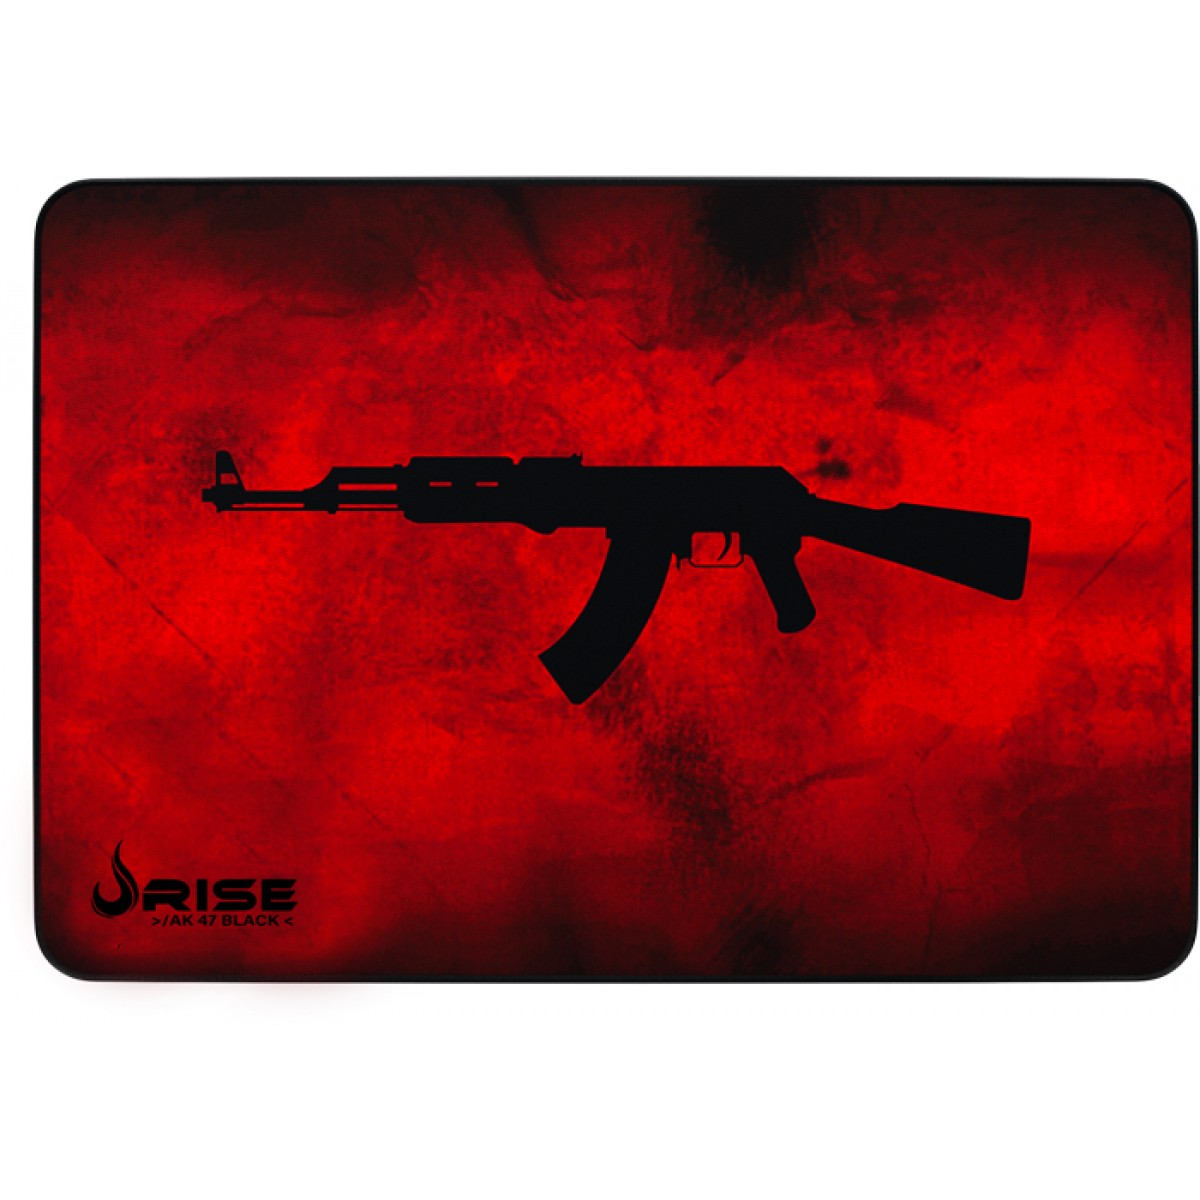 Mousepad Gamer Rise Mode AK47 Speed, Grande, Red, RG-MP-05-AKR